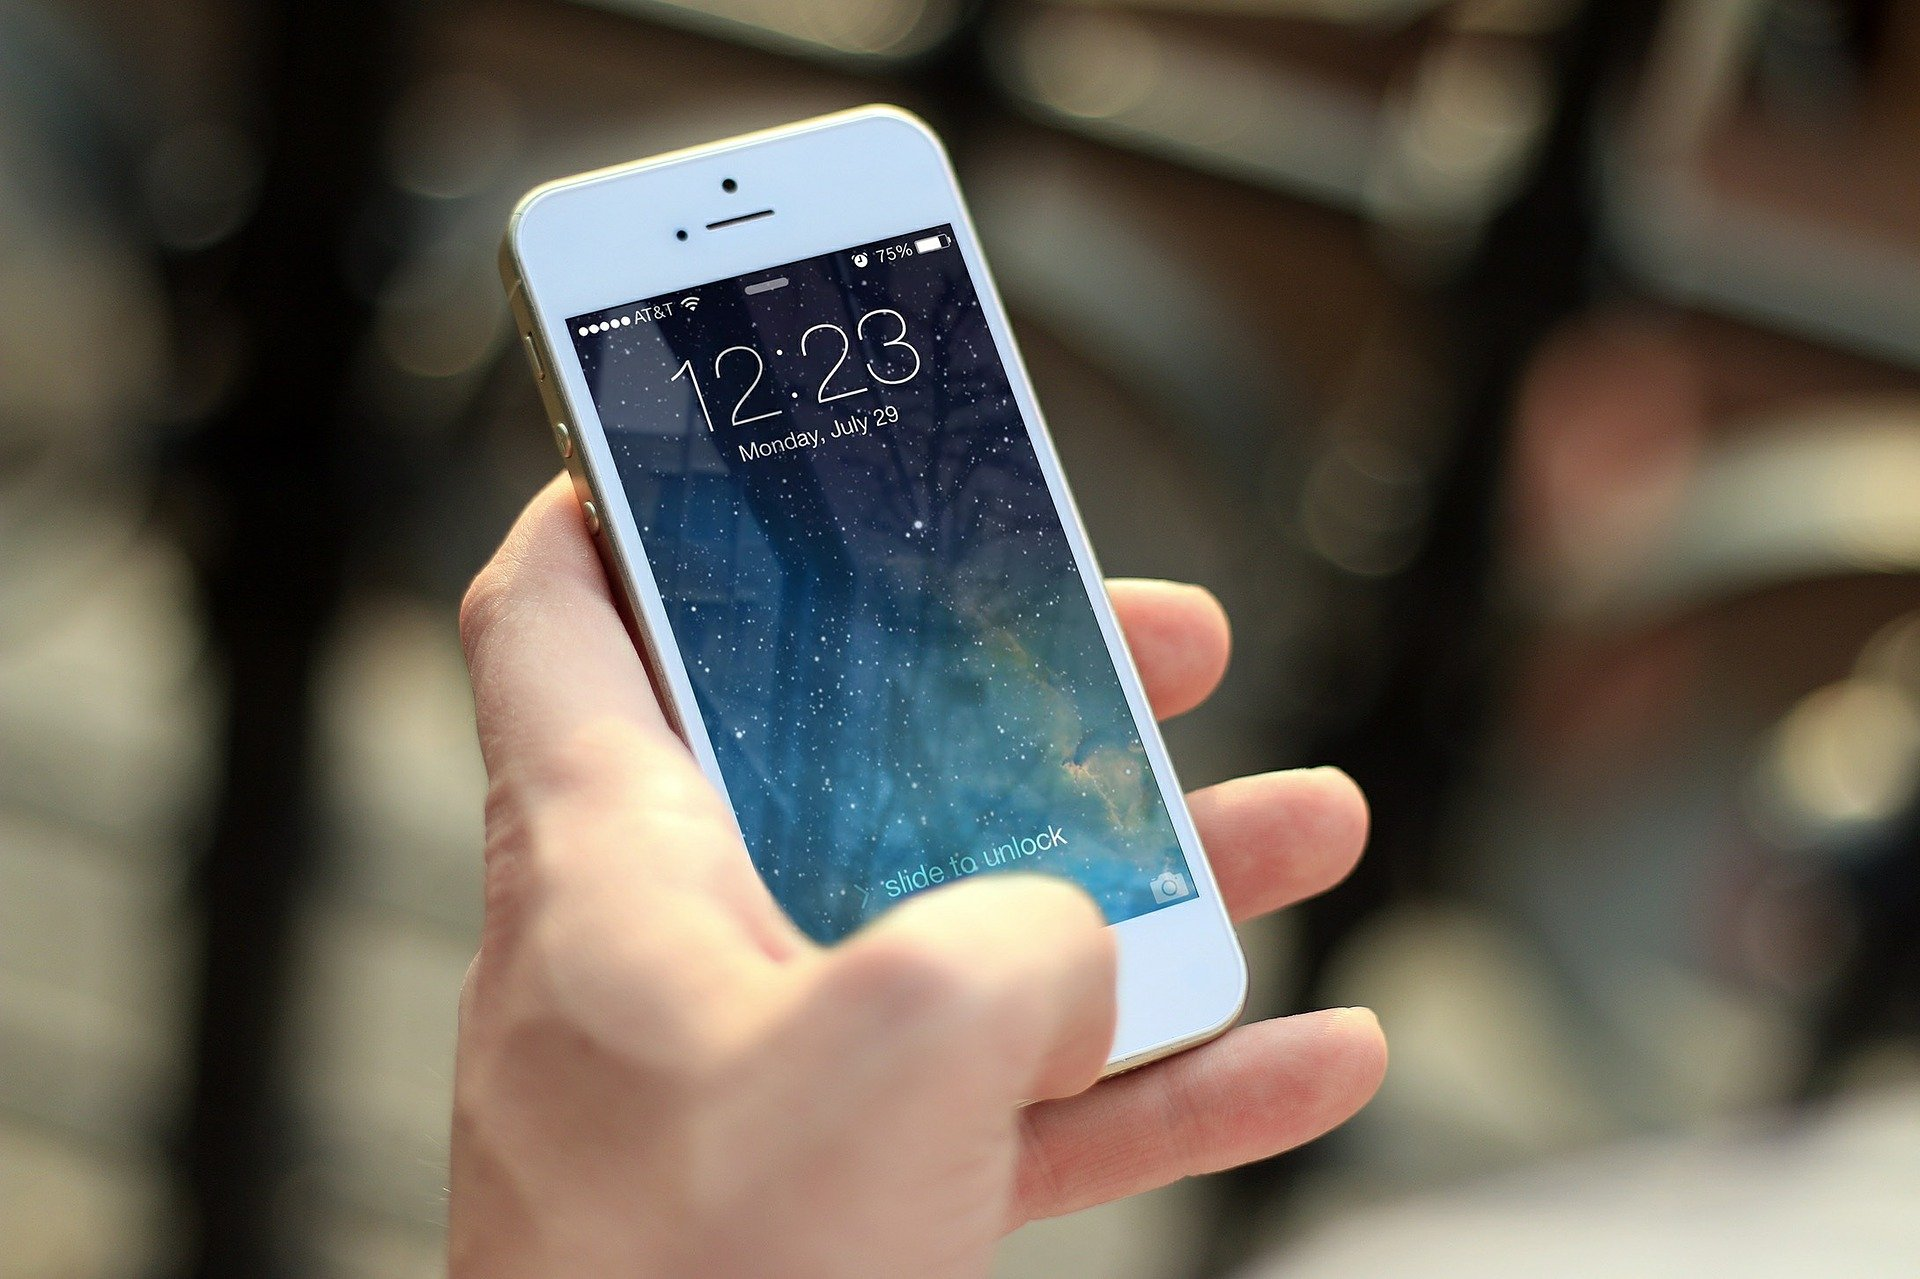 Mobile chi Atmakatha in Marathi | मोबाइलची आत्मकथा / मनोगत मराठी निबंध